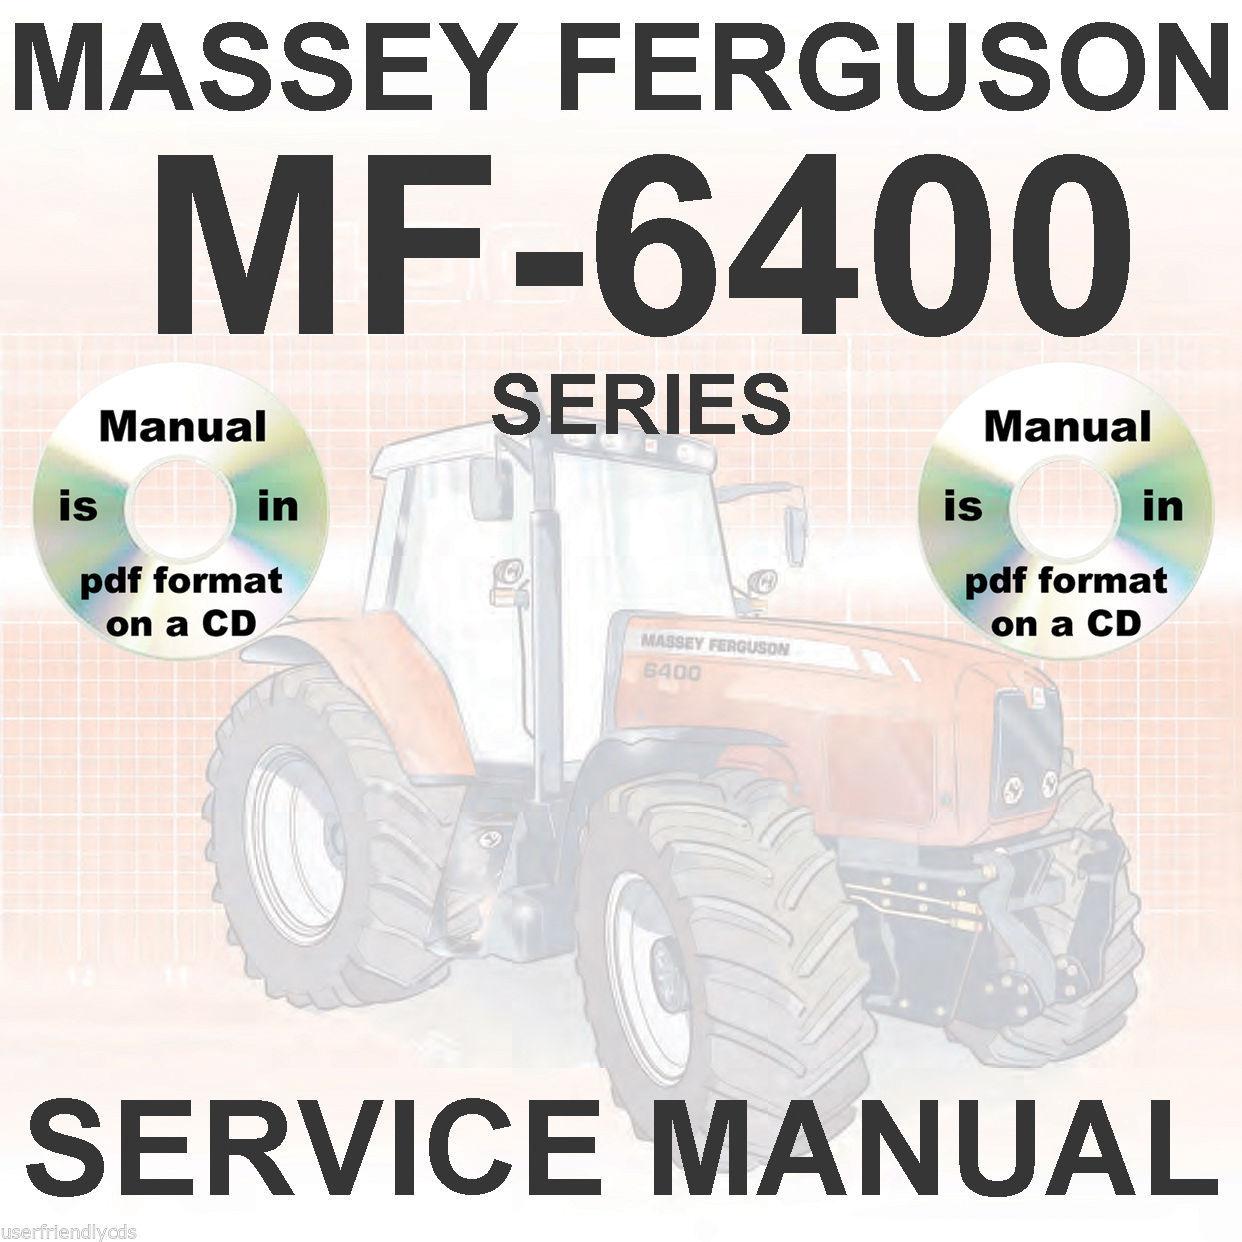 Massey Ferguson Tractors MF6495 MF6497 and 21 similar items